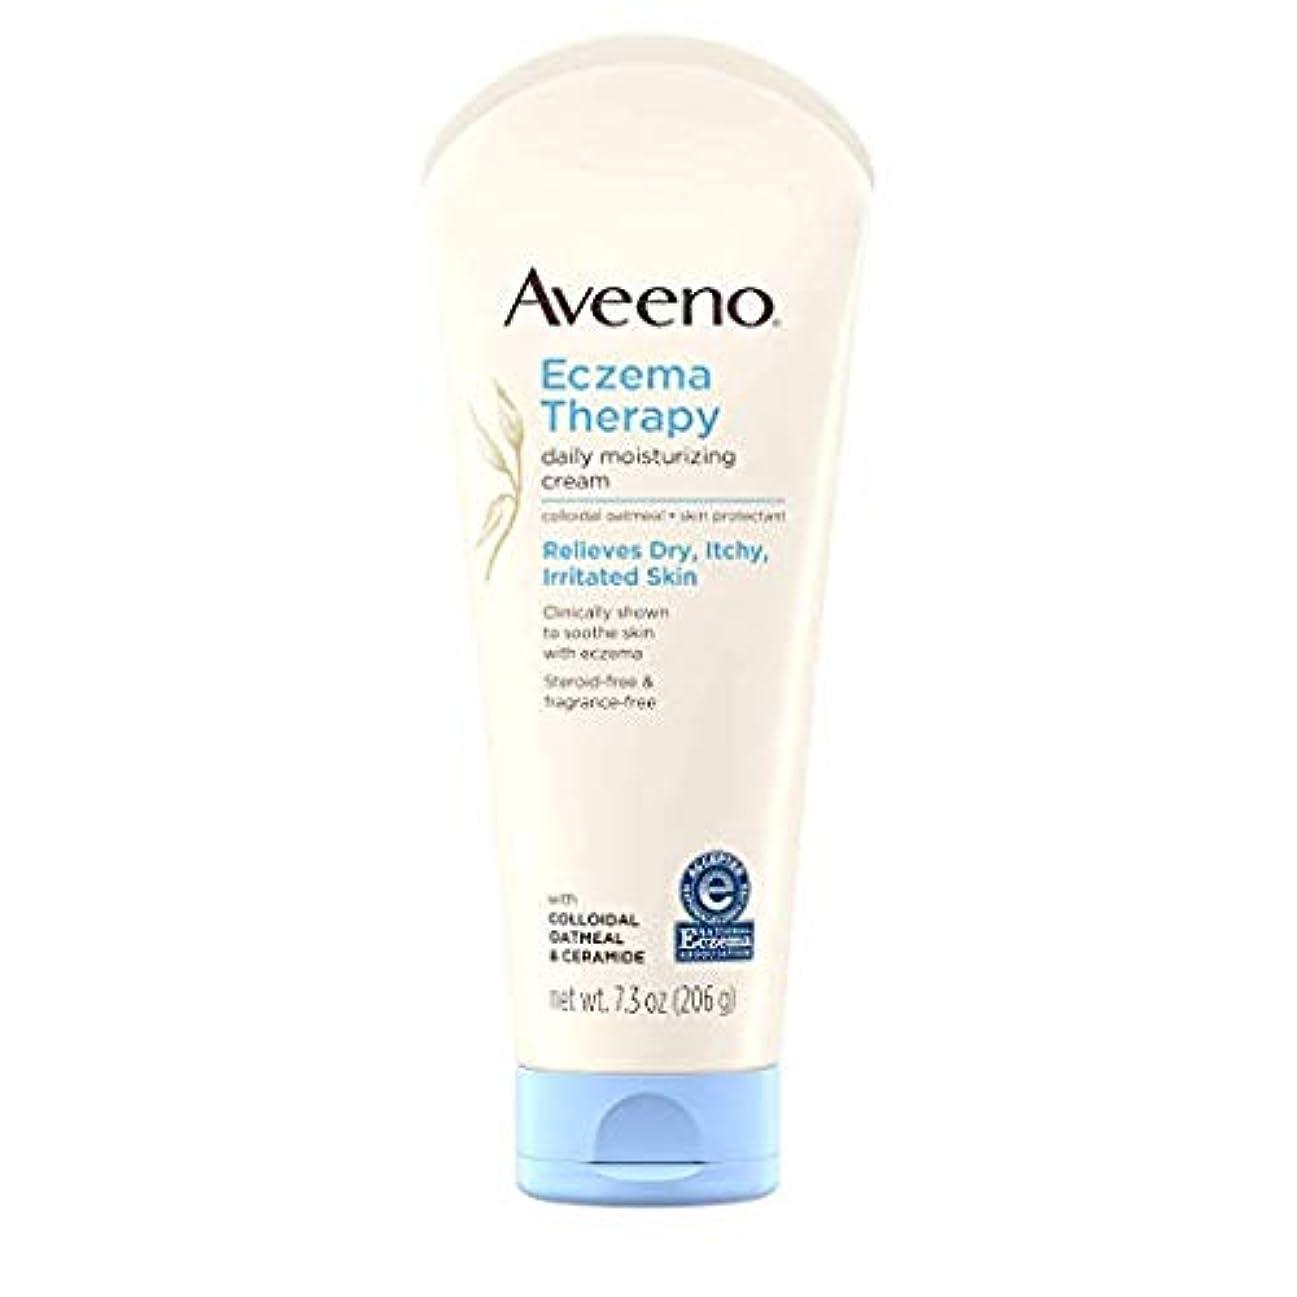 Aveeno - Eczema Therapy Moisturizing Cream - 7.3 oz (206 g) アビーノ 保湿クリーム [並行輸入品]